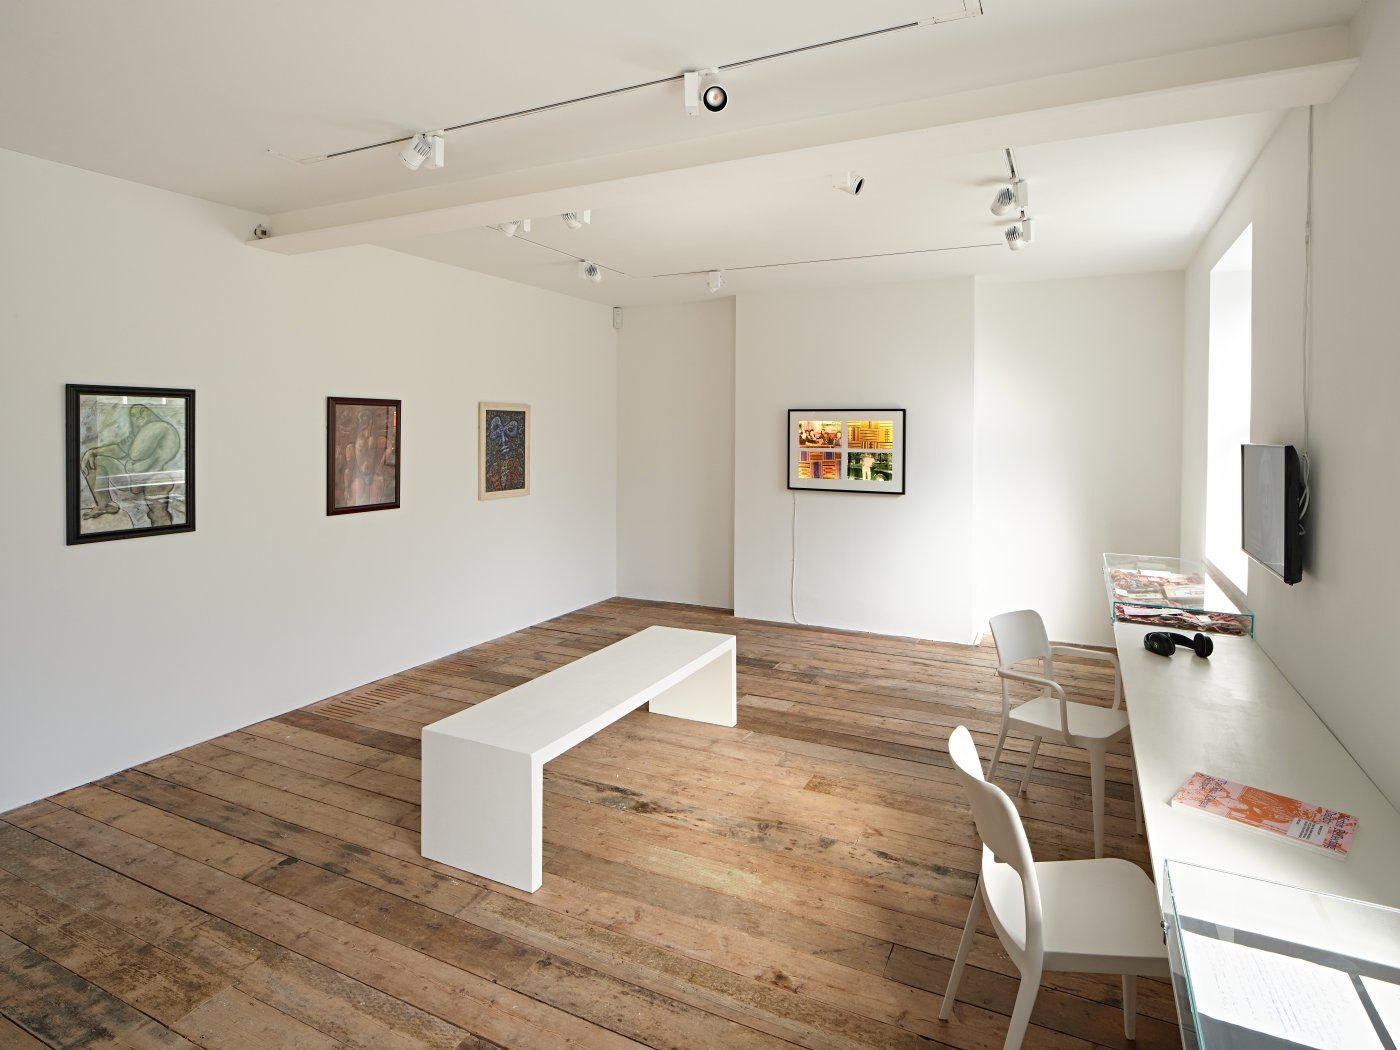 South London Gallery Rita Keegan 5